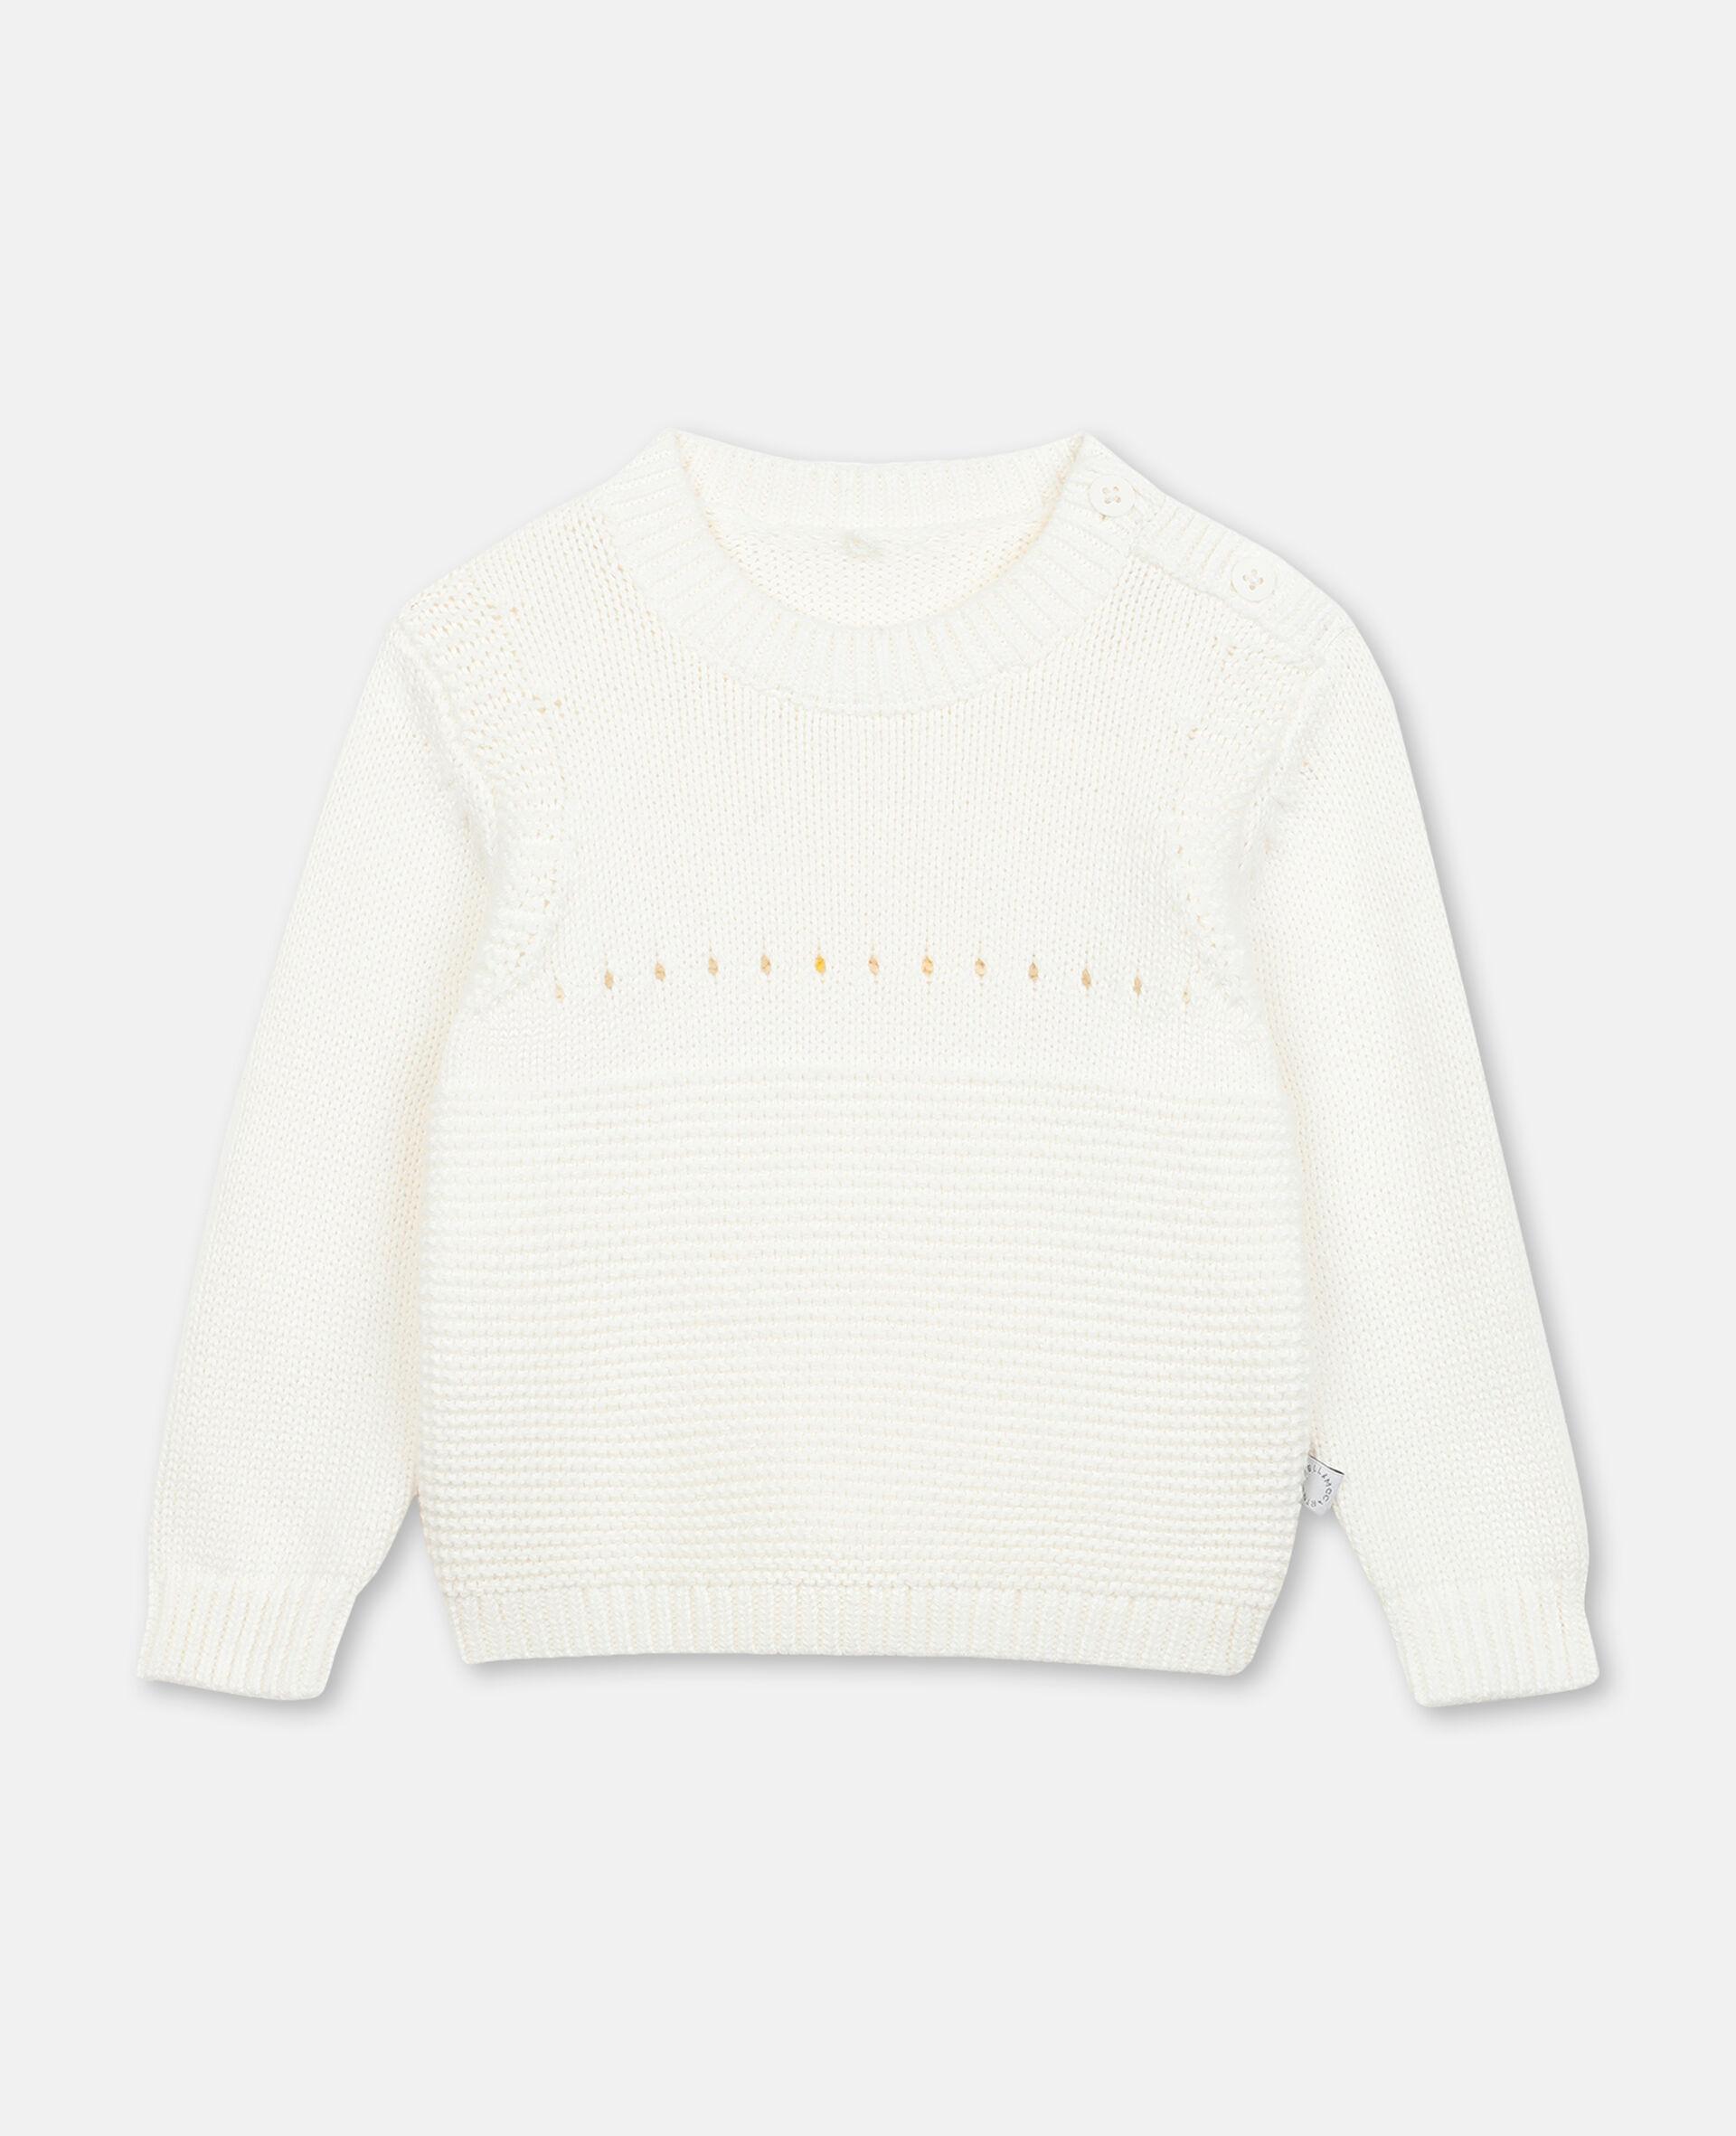 Bunny Knit Jumper -White-large image number 0